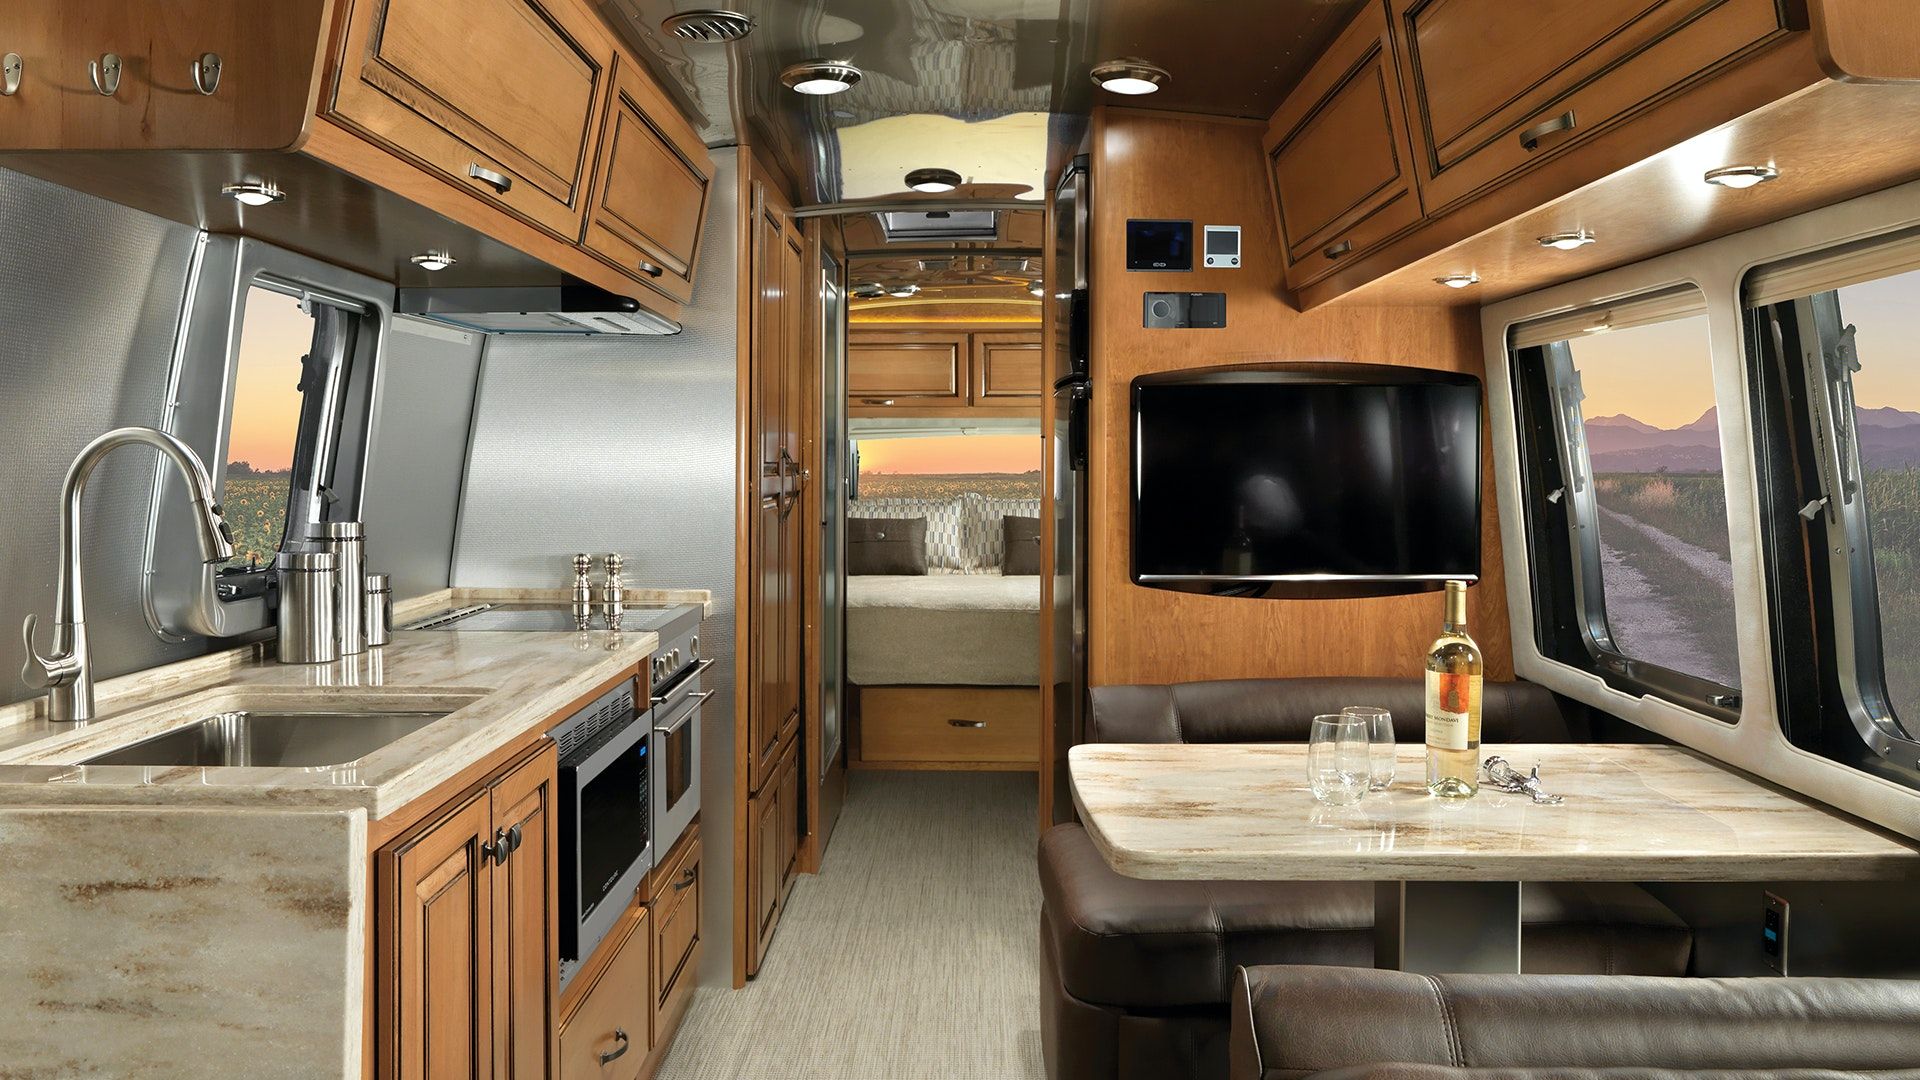 Incroyable Airstream